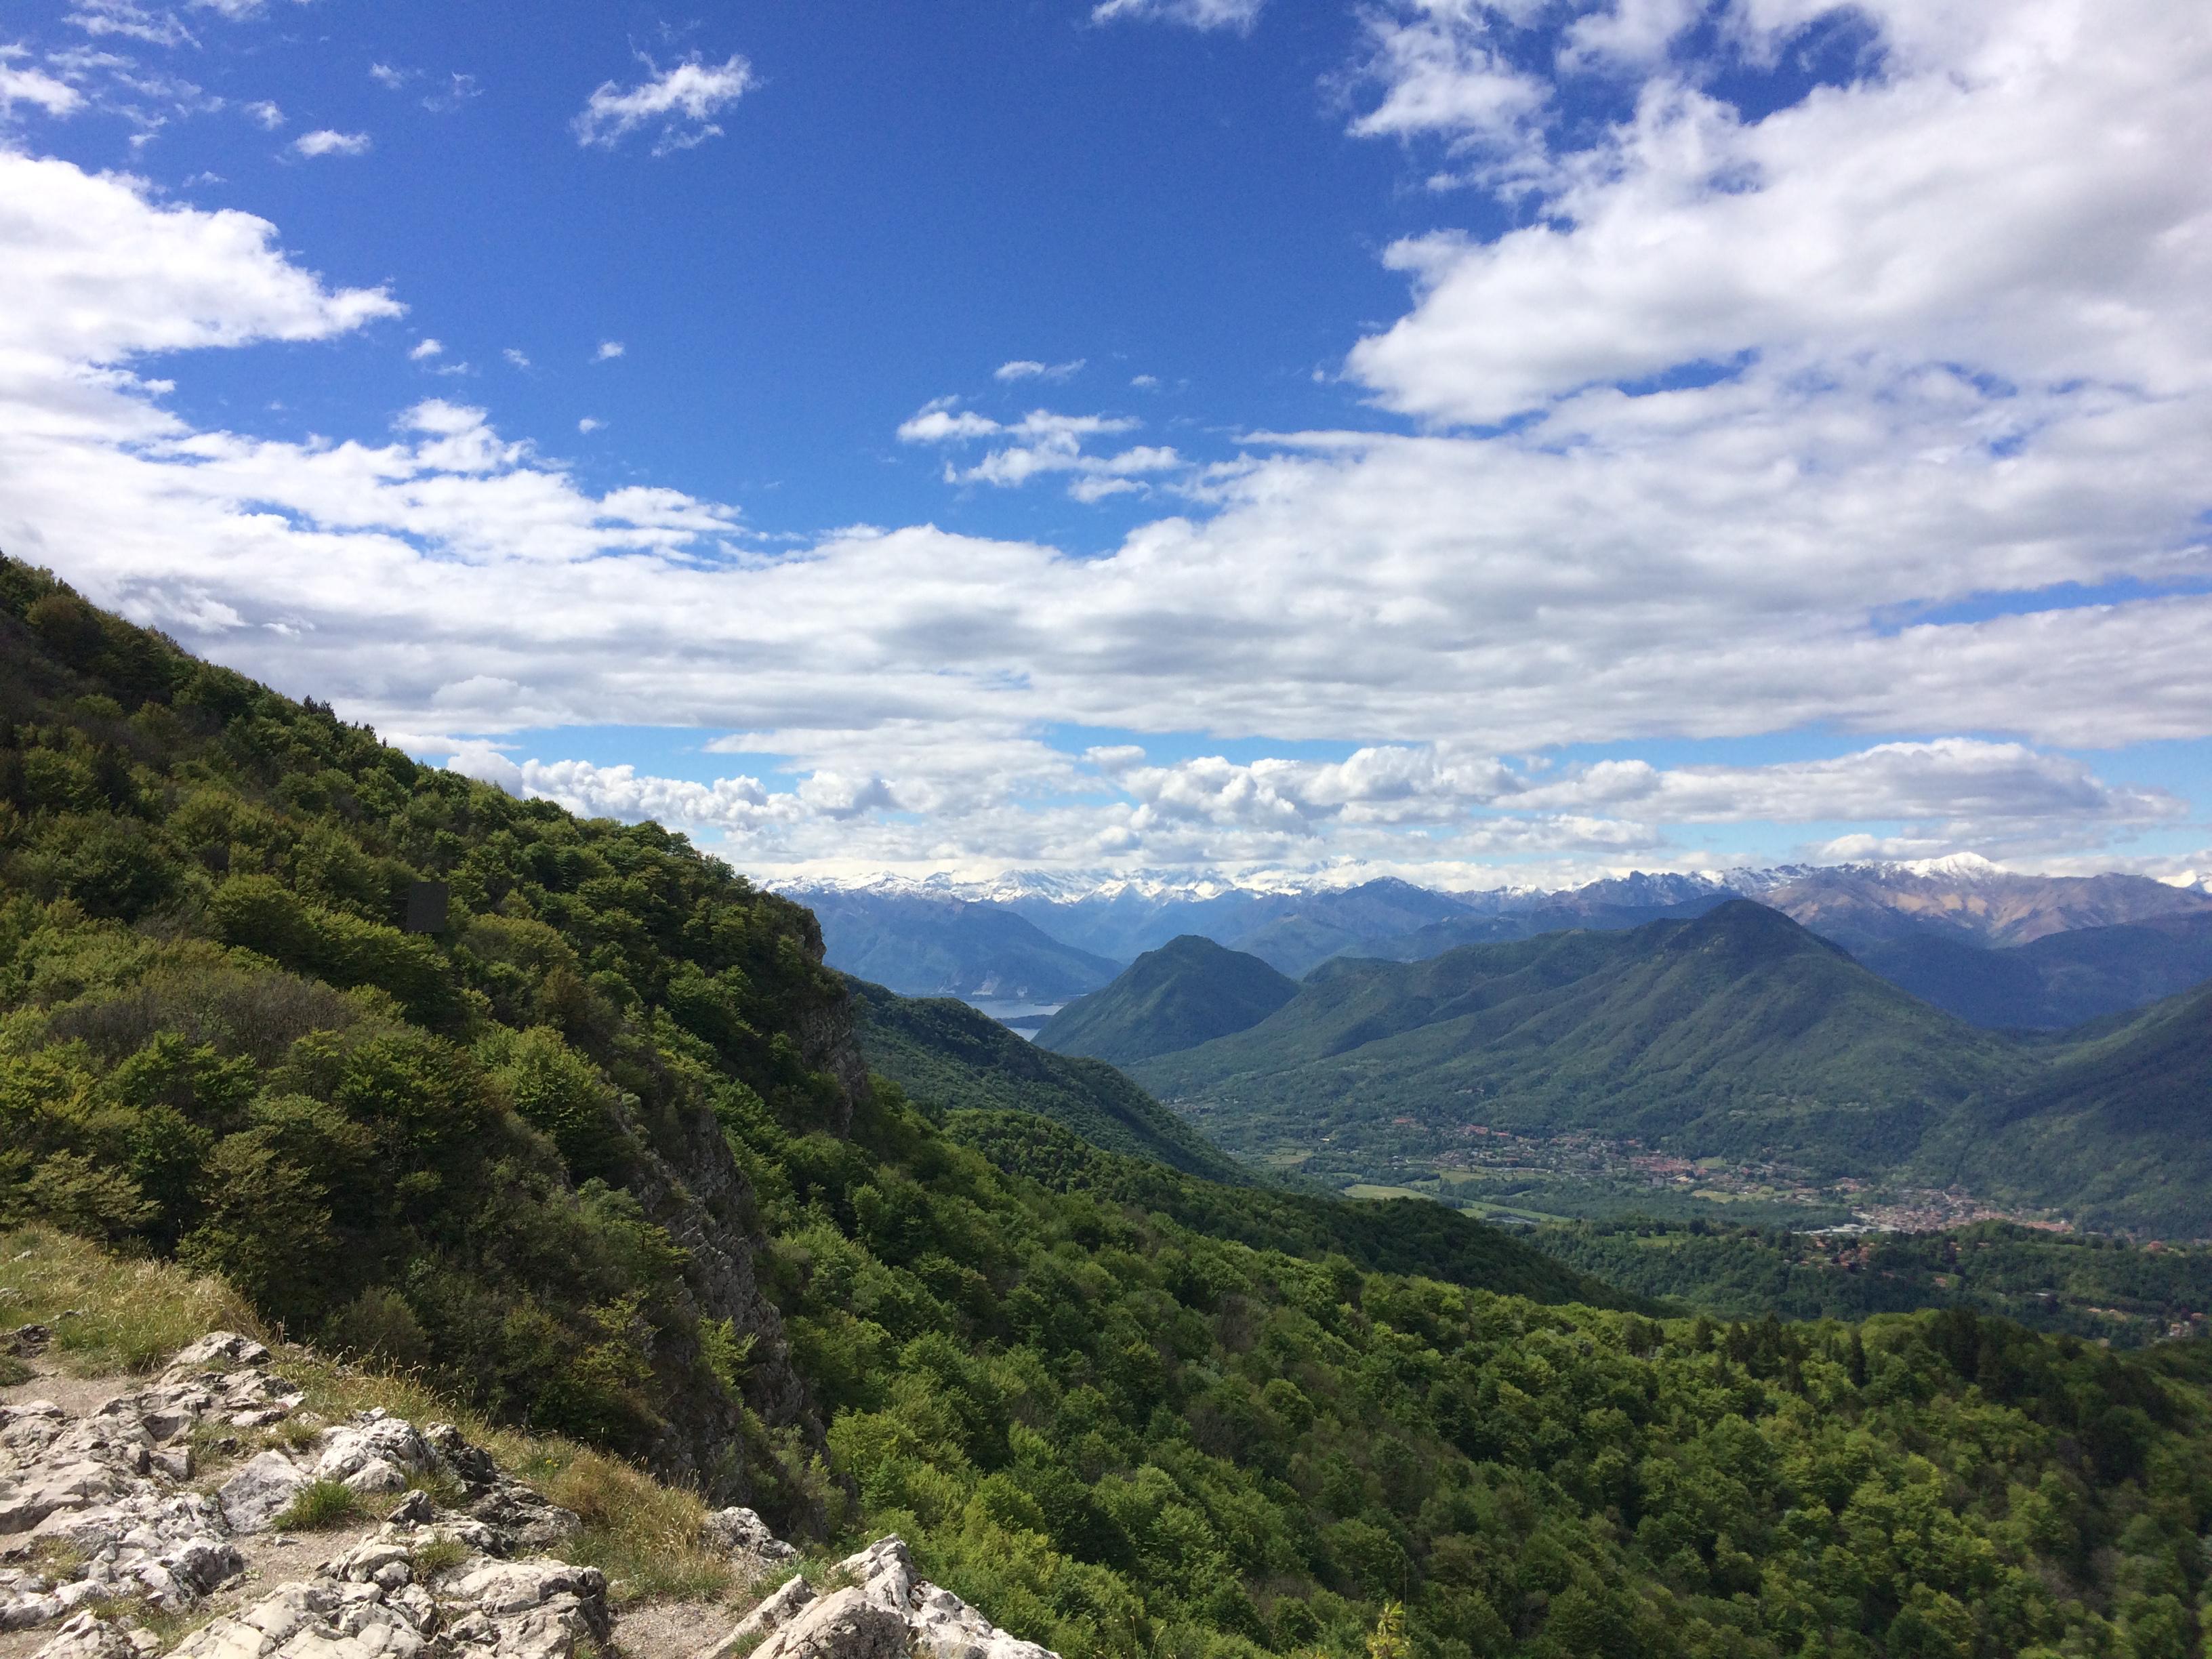 Panorama dal Campo dei Fiori - Osteria Irma - Varese